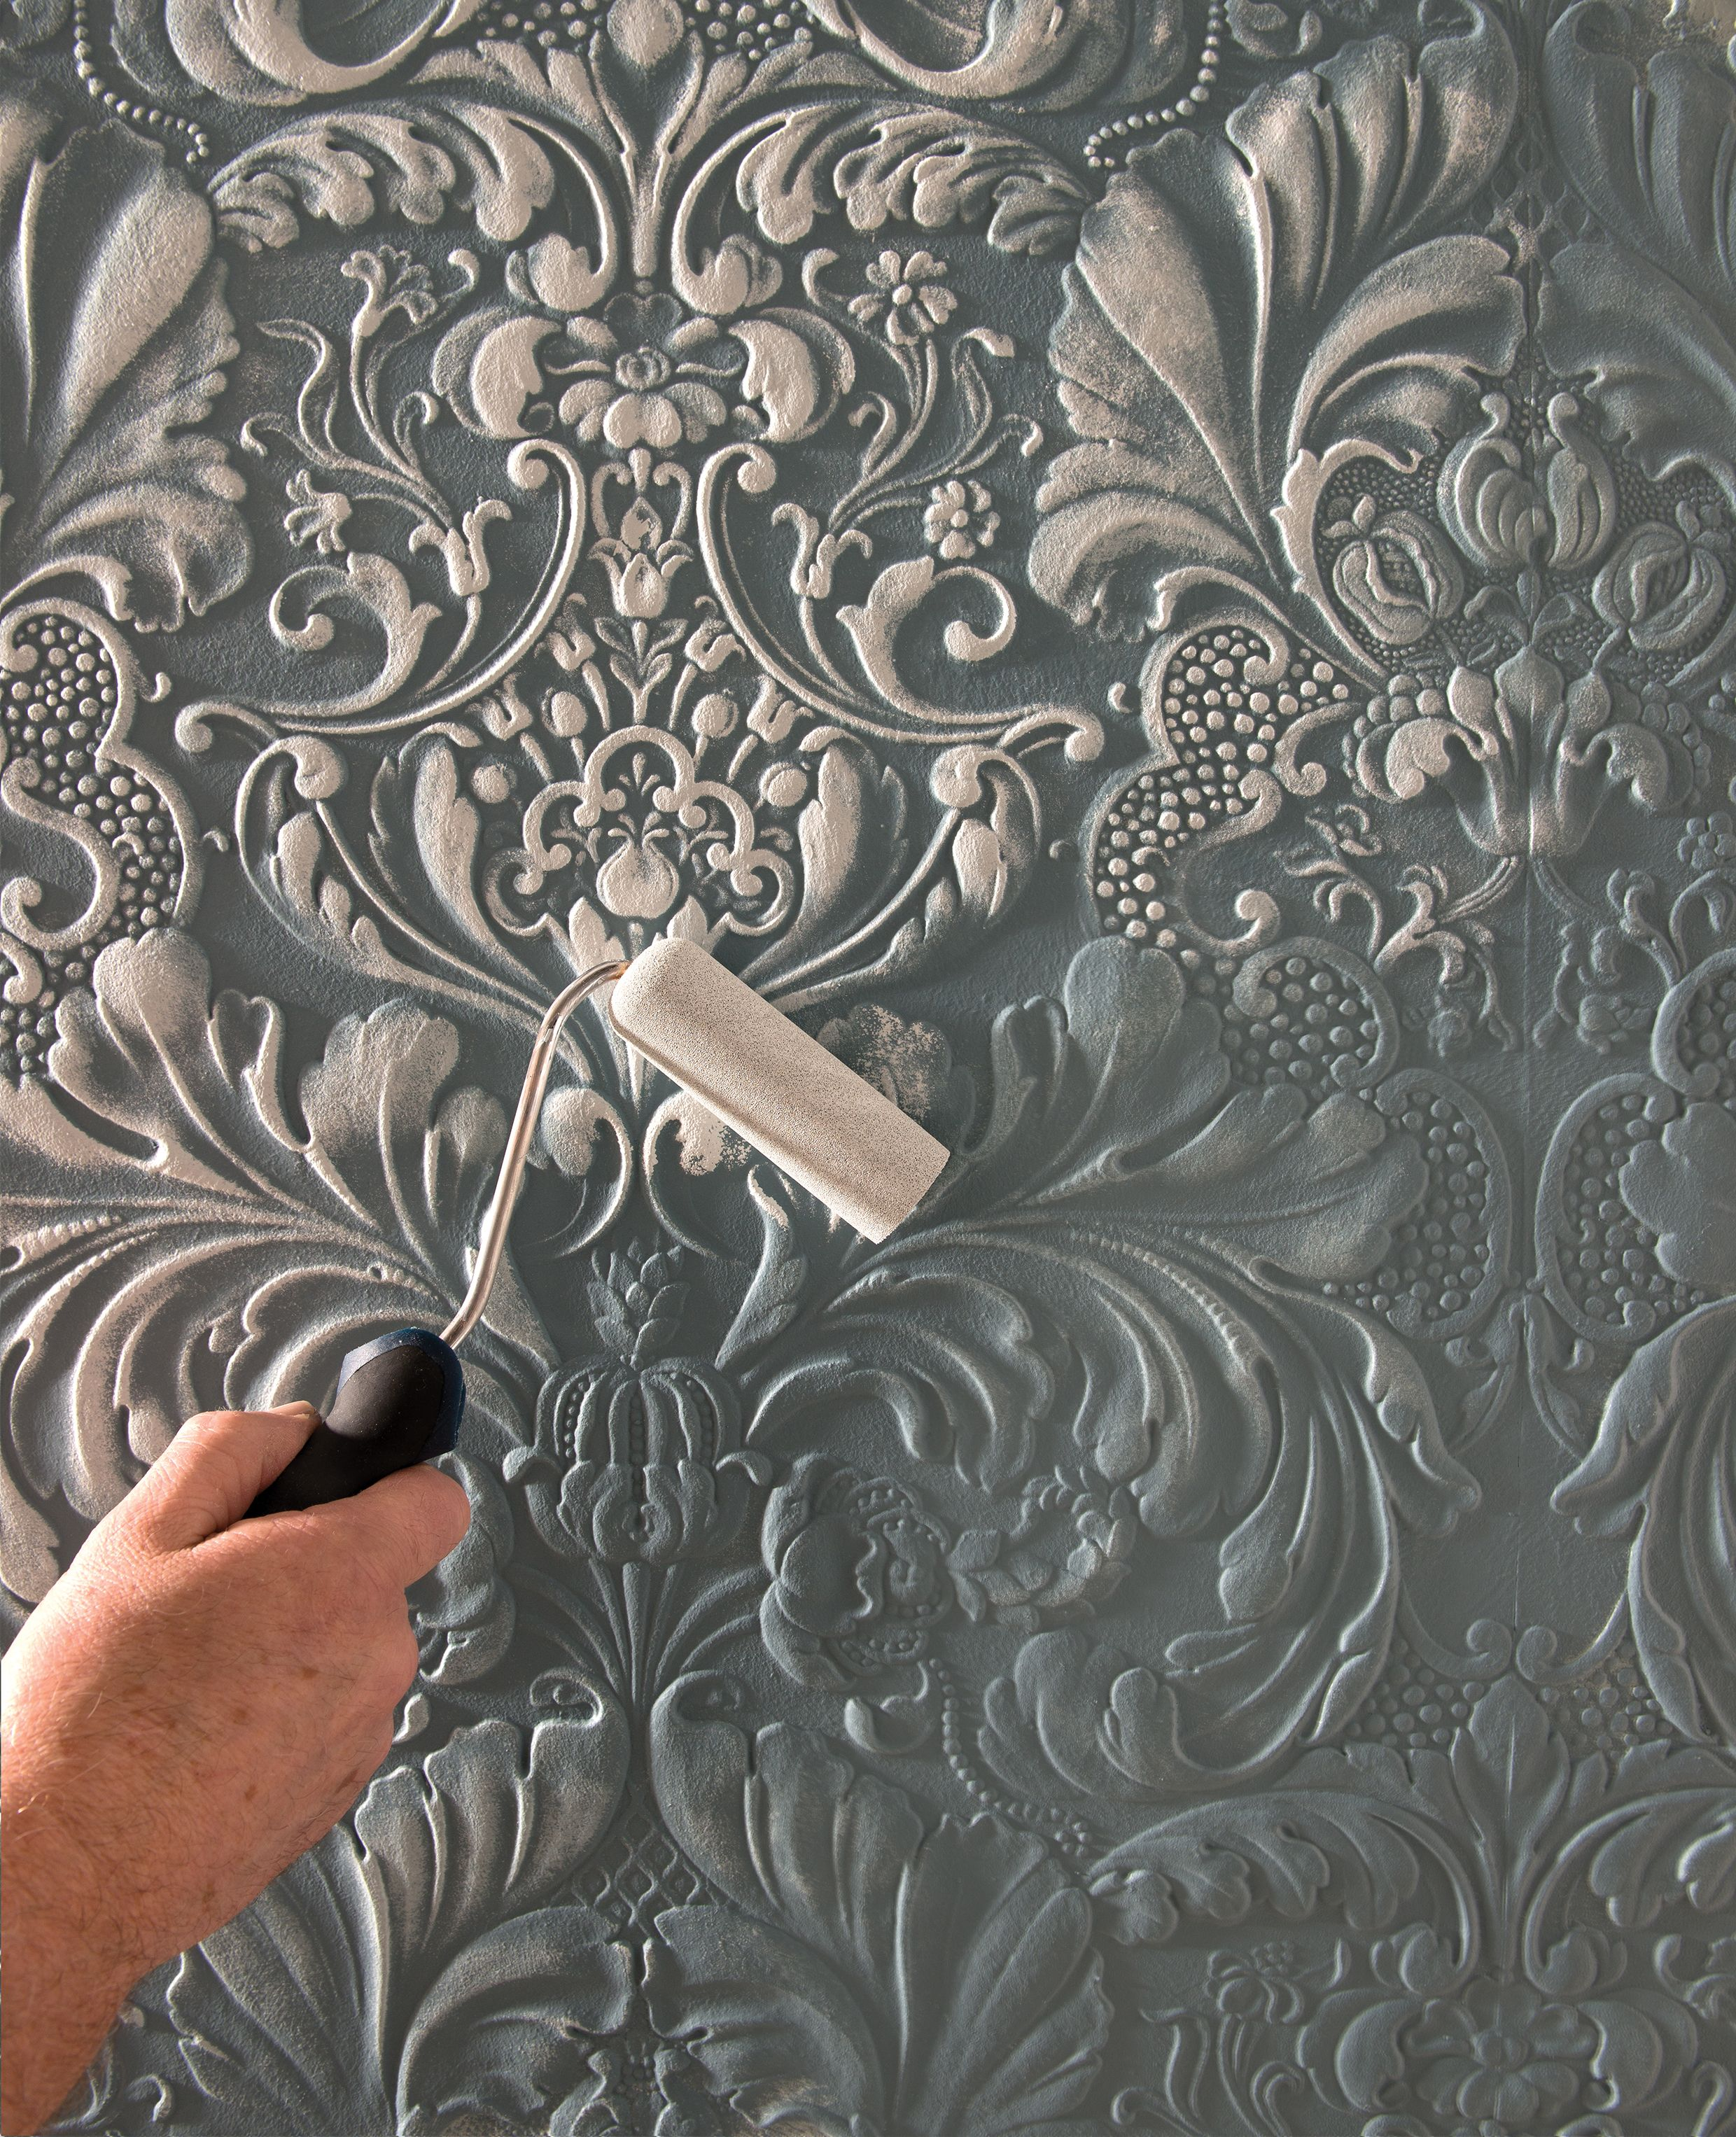 Paintable Wallpaper Creating Dimension 壁装飾 部屋の装飾 壁紙 インテリア